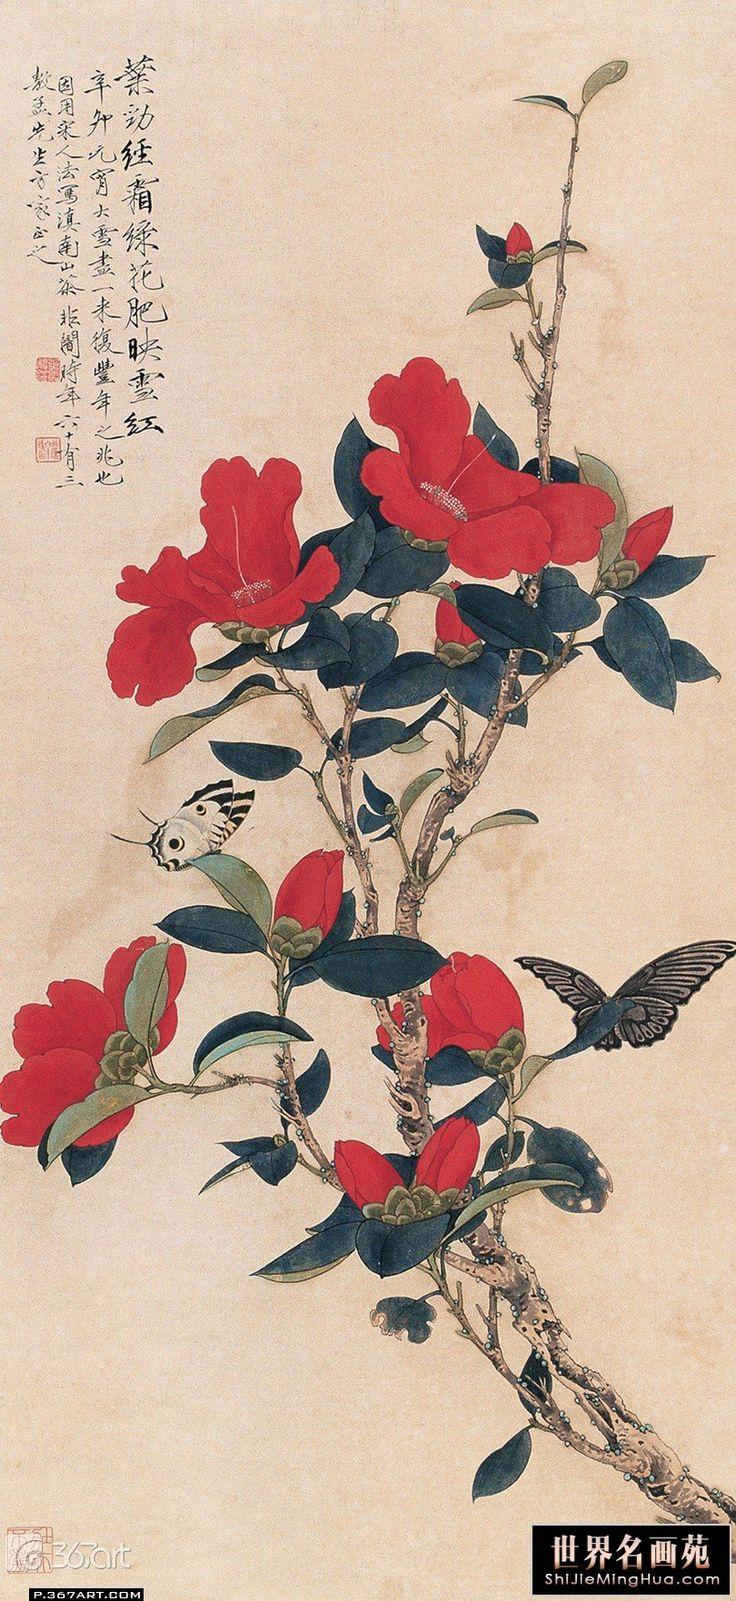 Yu Feian(于 非闇 Chinese, 1889-1959 Chinese Camelia